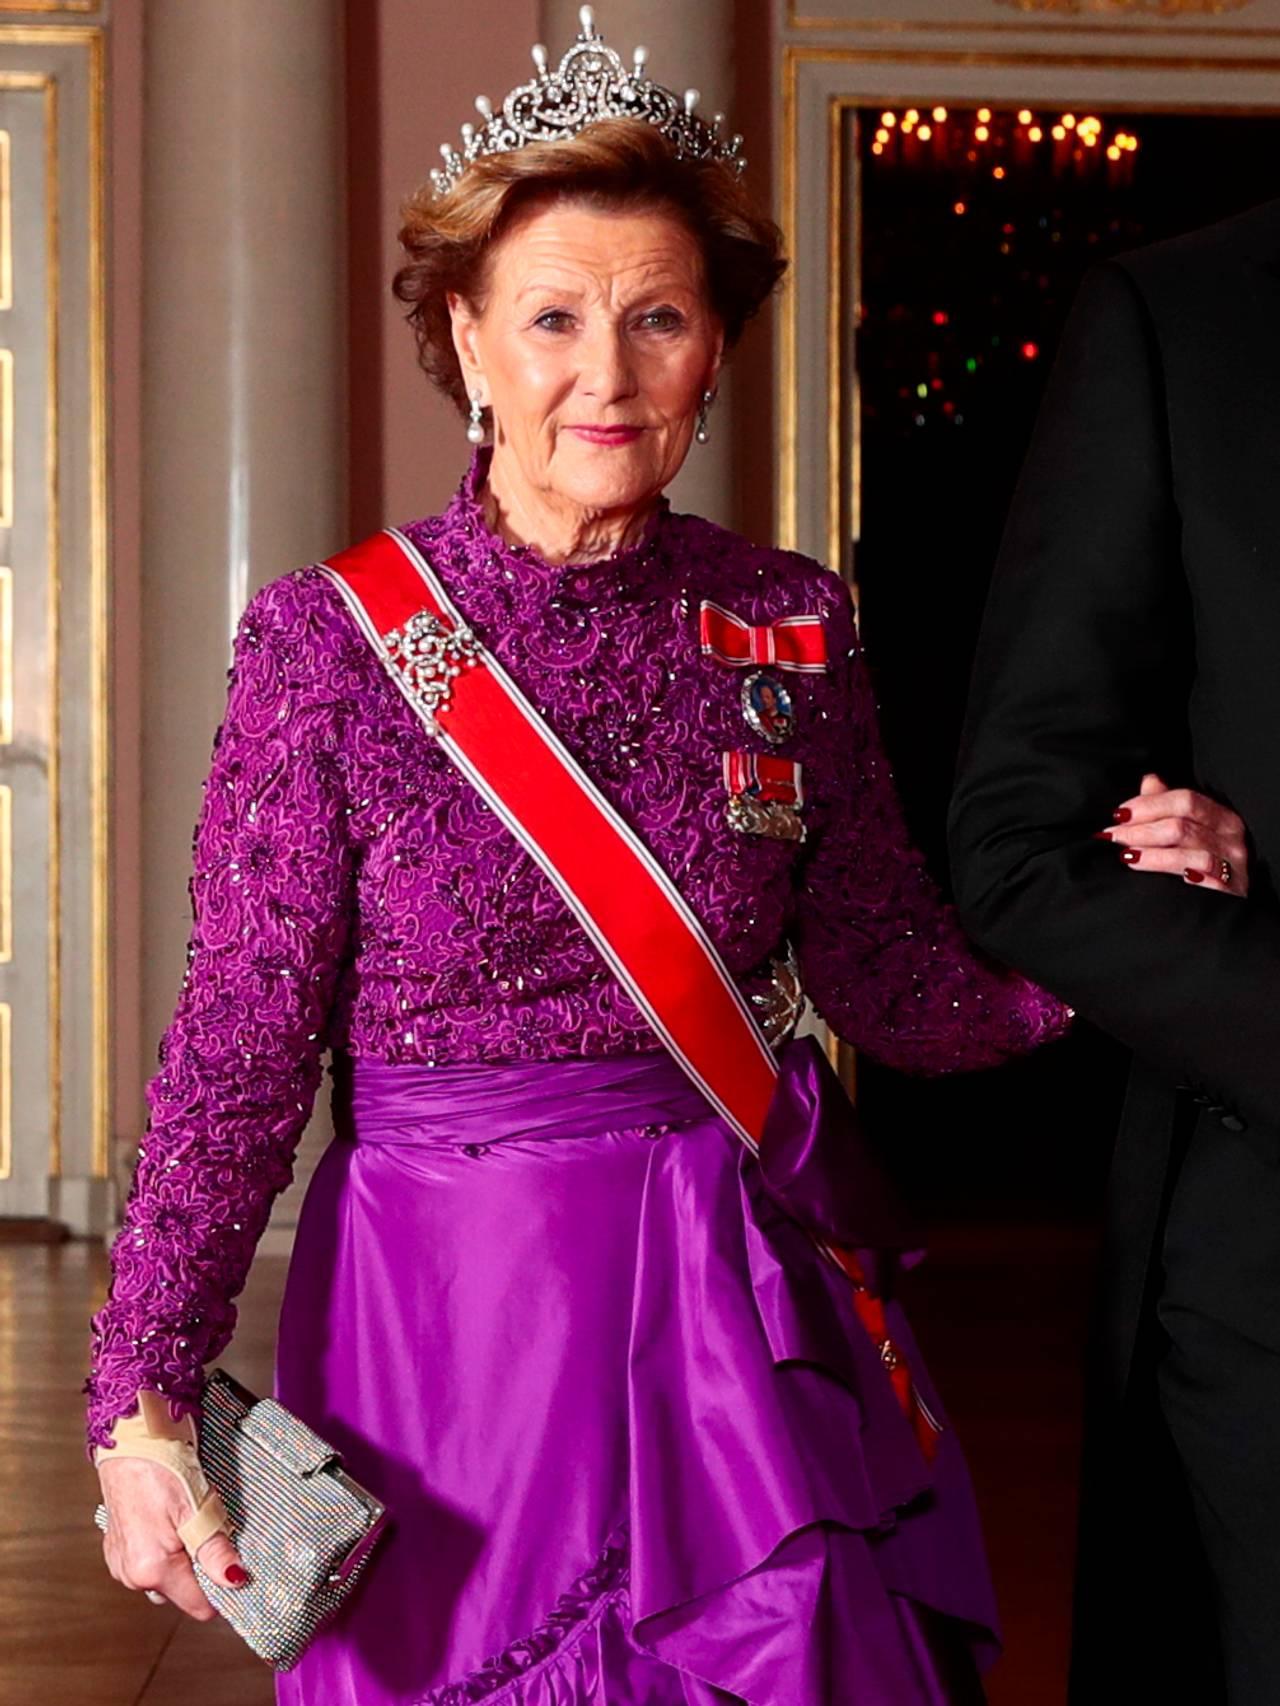 Dronning Sonja lilla kjole